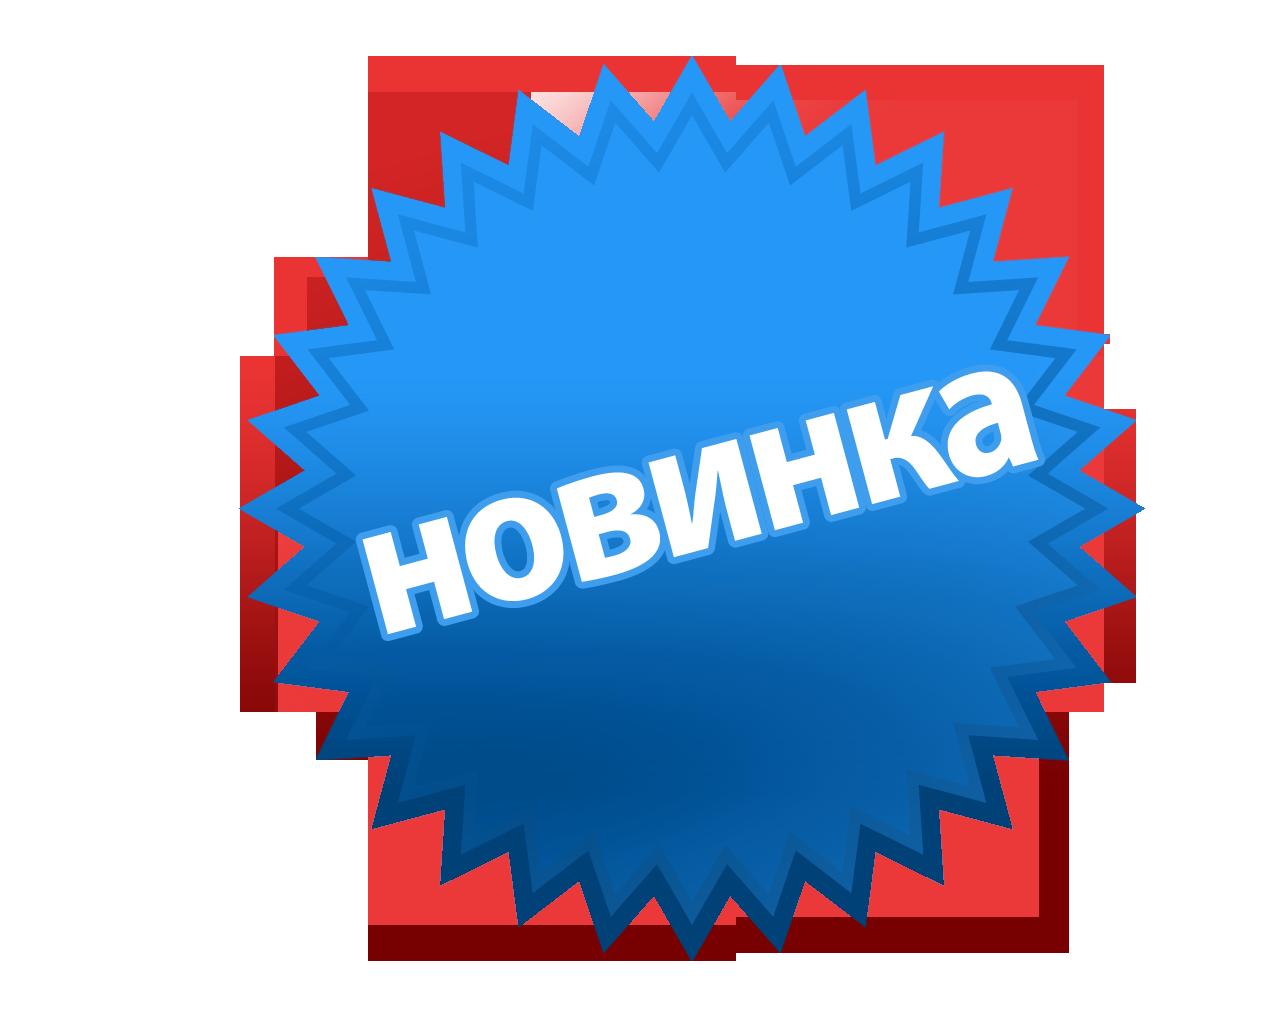 http://profivann.com.ua/wp-content/uploads/2013/02/promo-%D0%BD%D0%BE%D0%B2%D0%B8%D0%BD%D0%BA%D0%B0.png